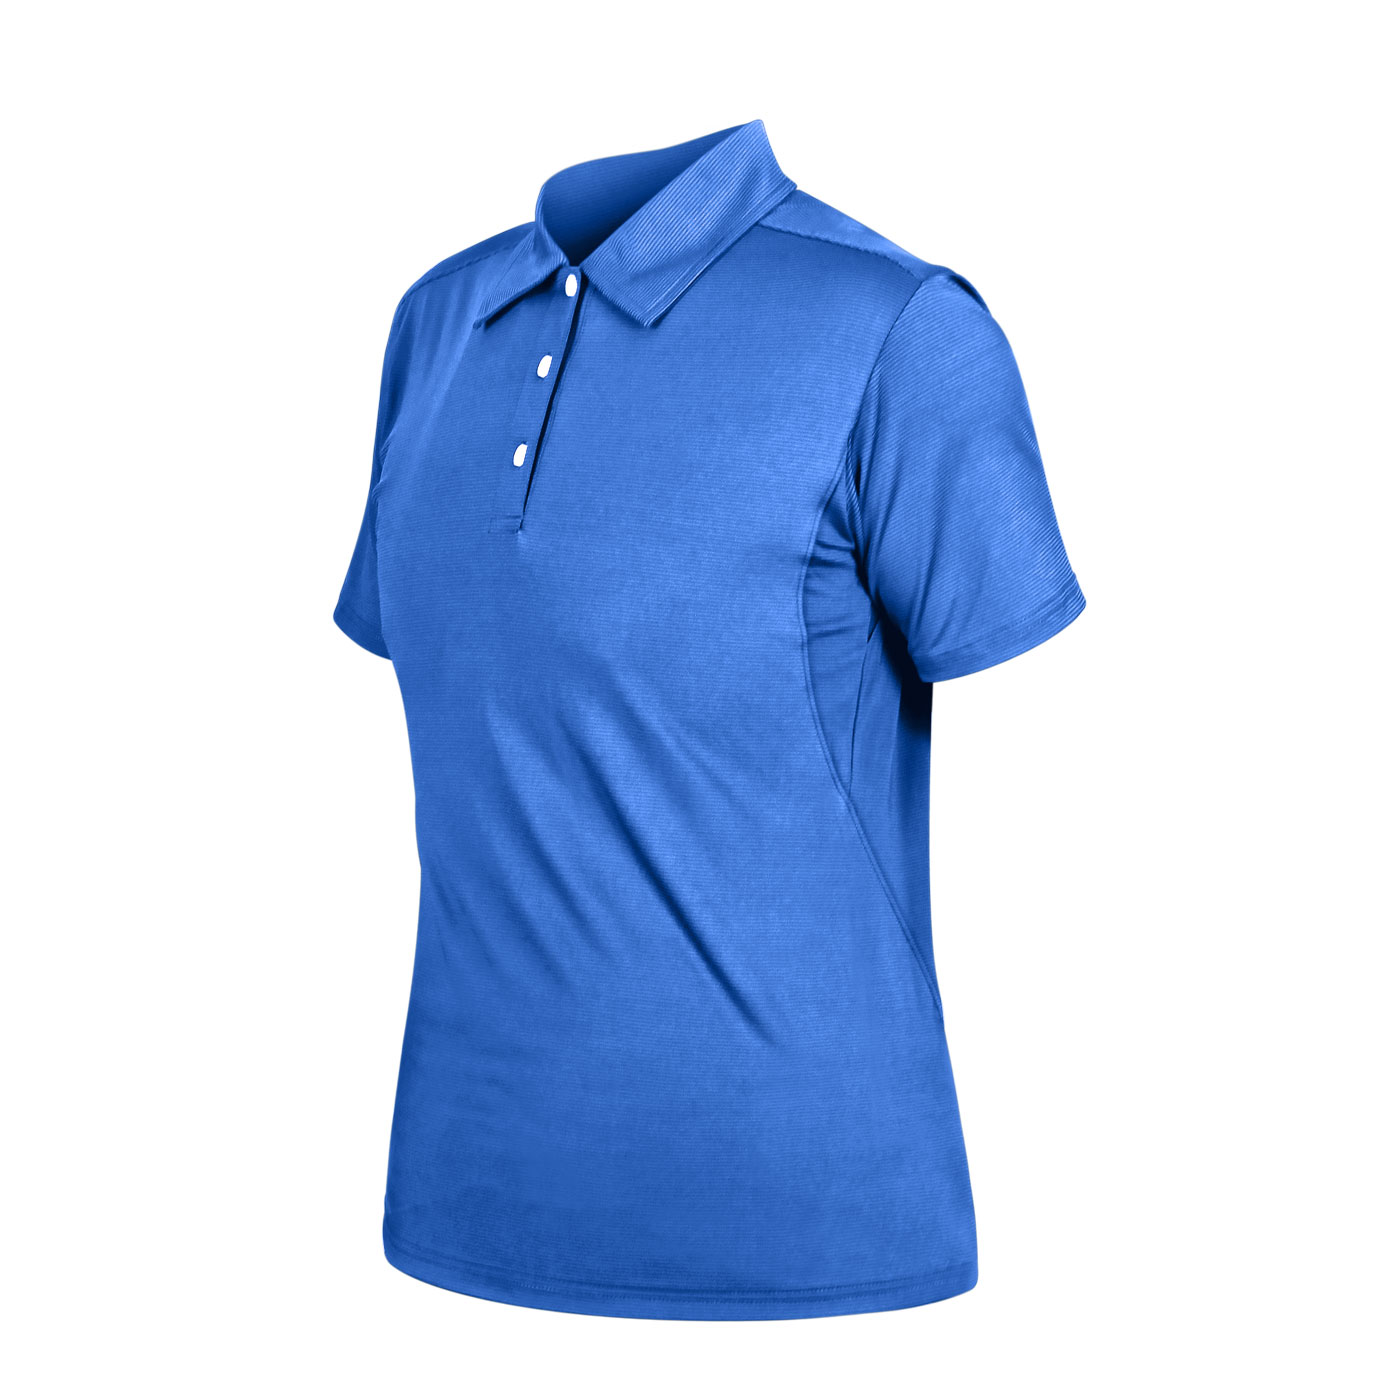 HODARLA 星魁剪接短袖POLO衫 3162101 - 藍條紋